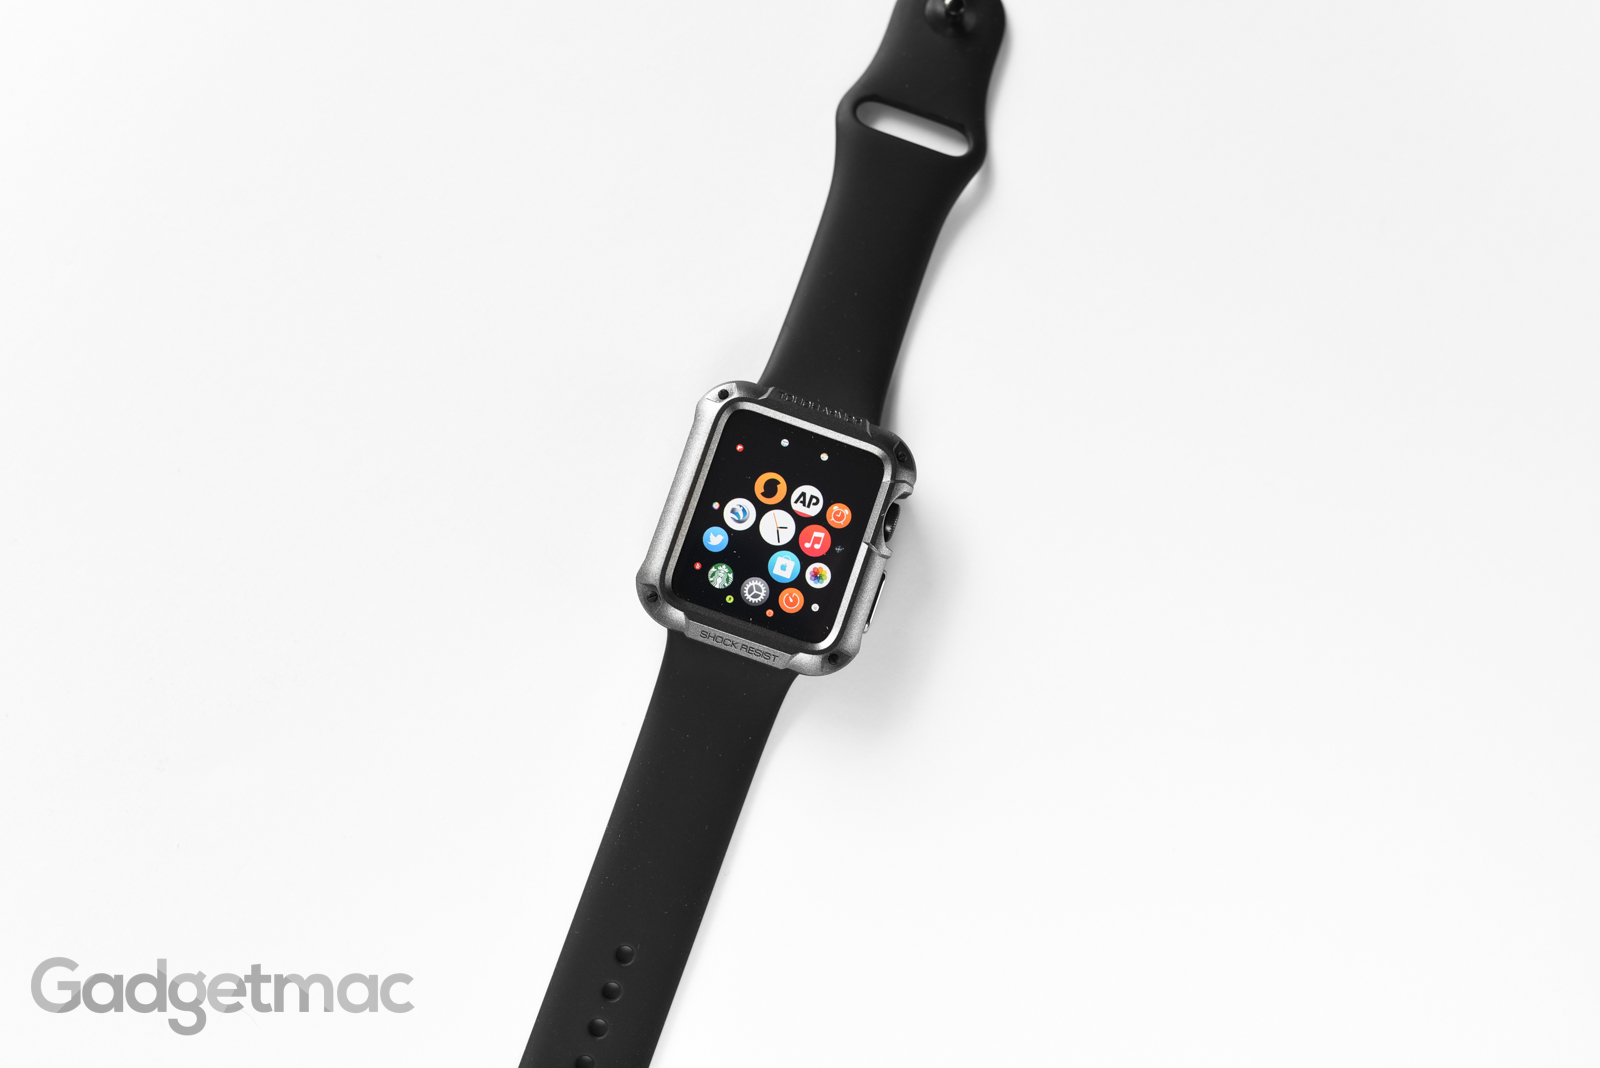 spigen-tough-armor-case-for-apple-watch-4.jpg